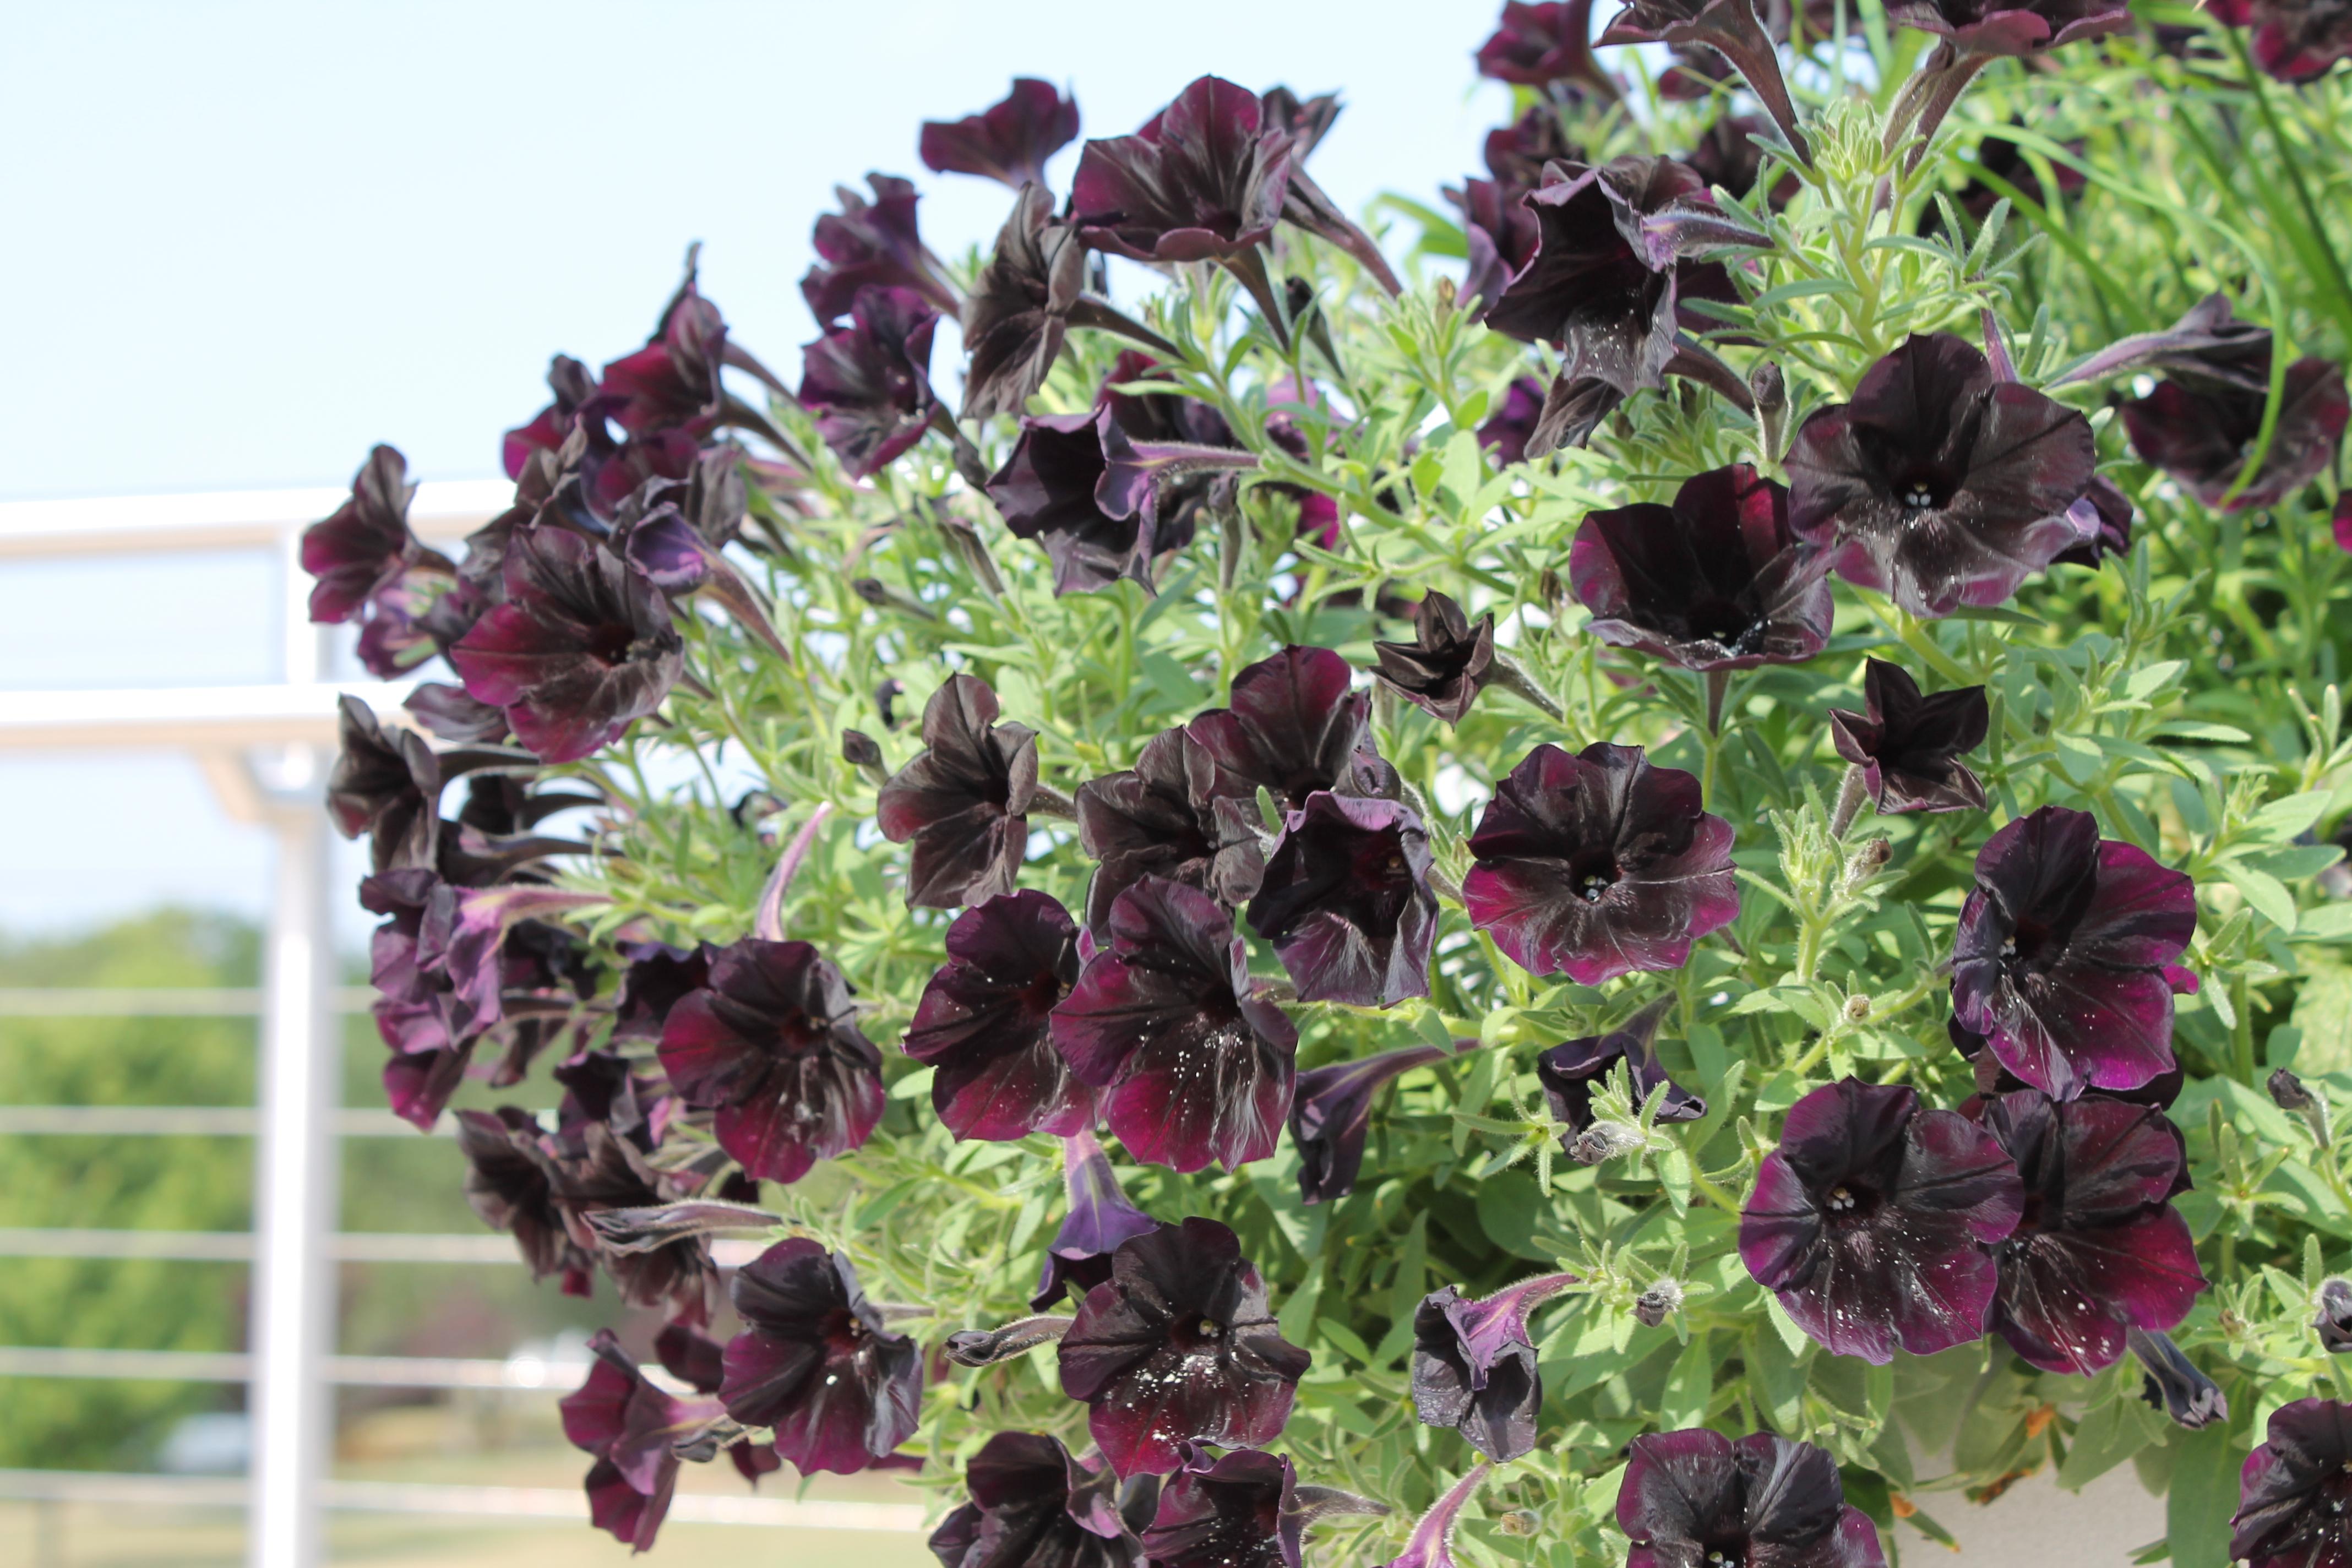 MSU Flower Variety Trial in Full Swing Despite Heat